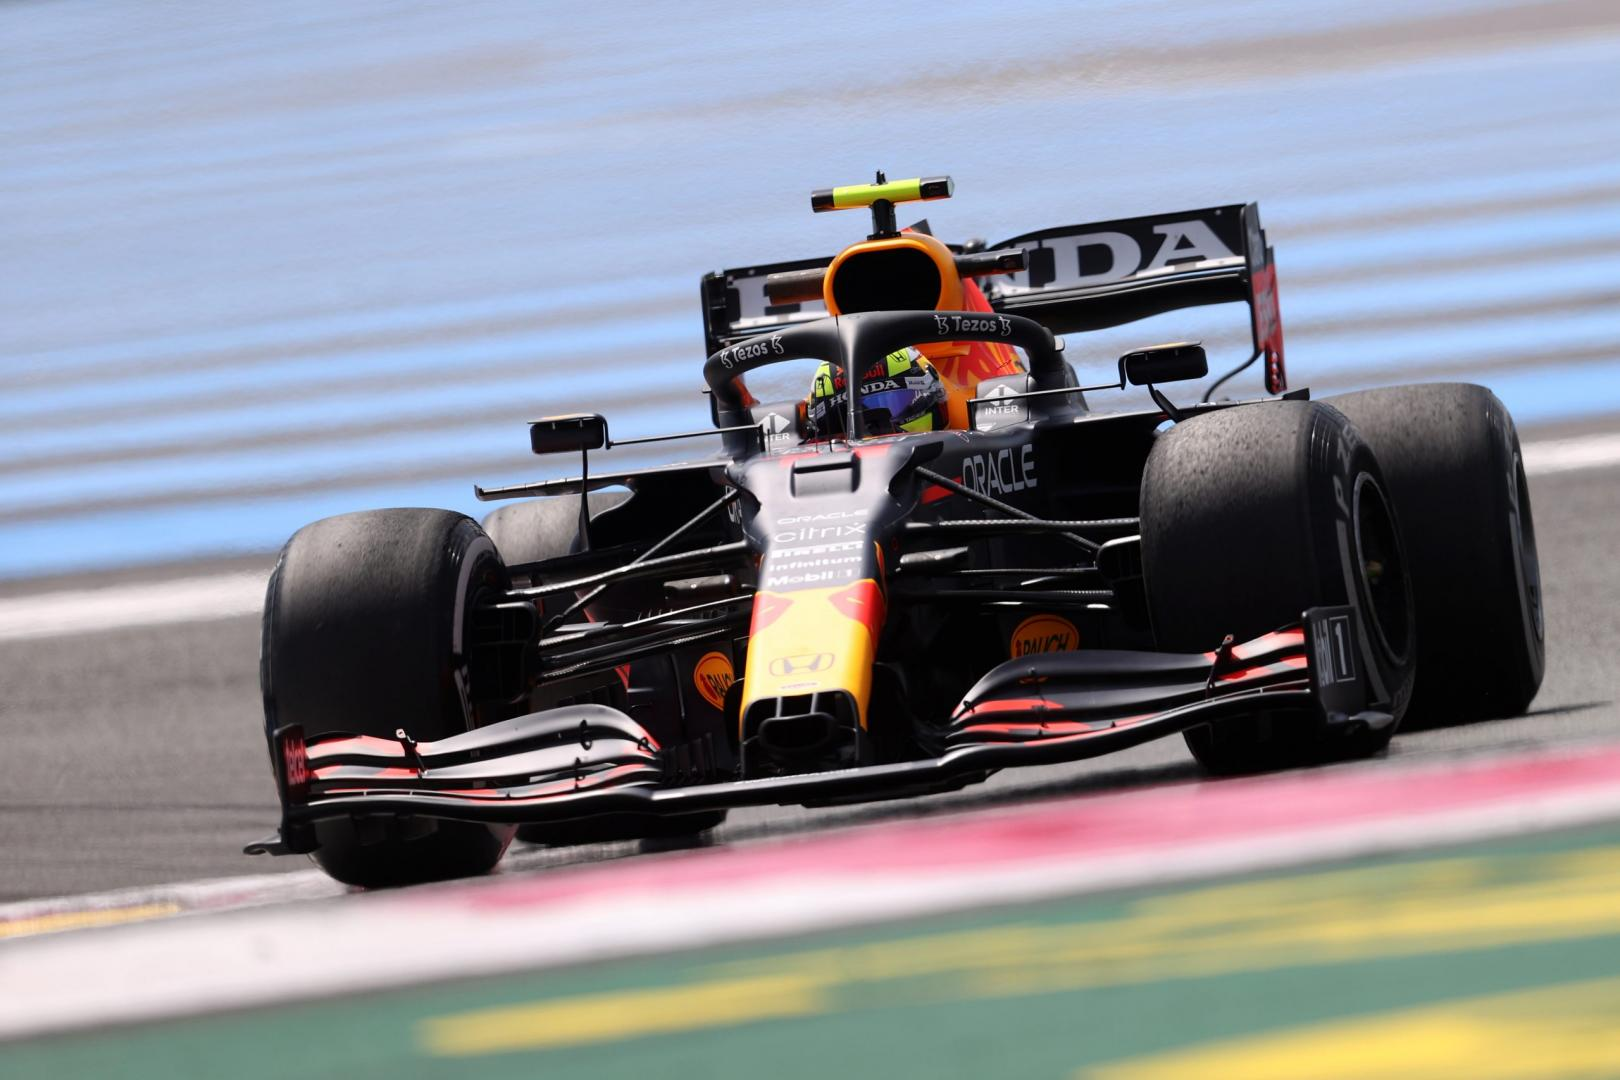 2e vrije training van de GP van Frankrijk 2021